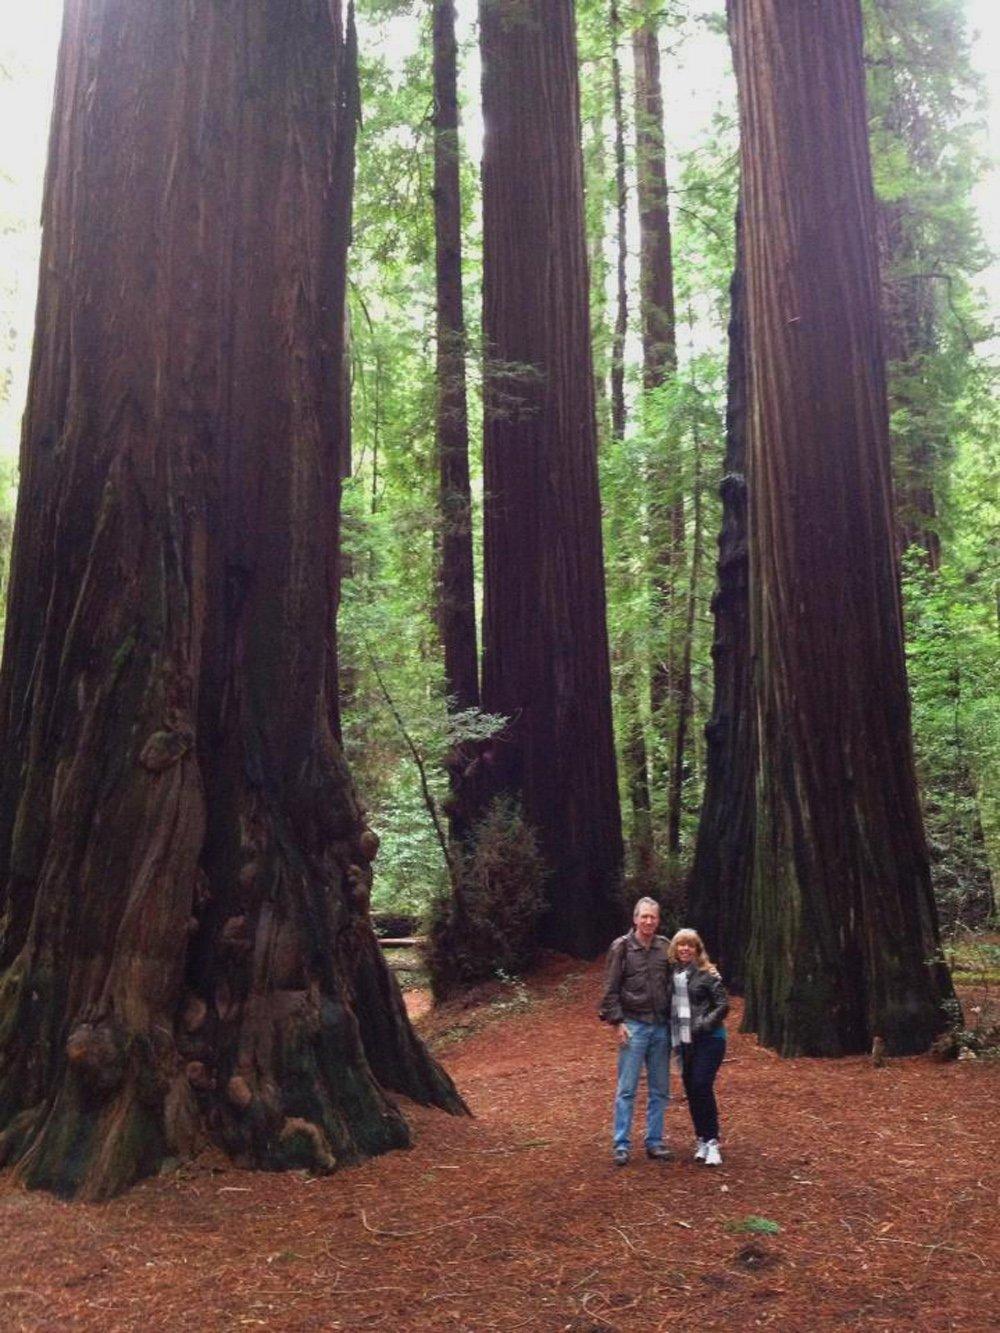 Giant redwoods at Humboldt Redwoods State Park